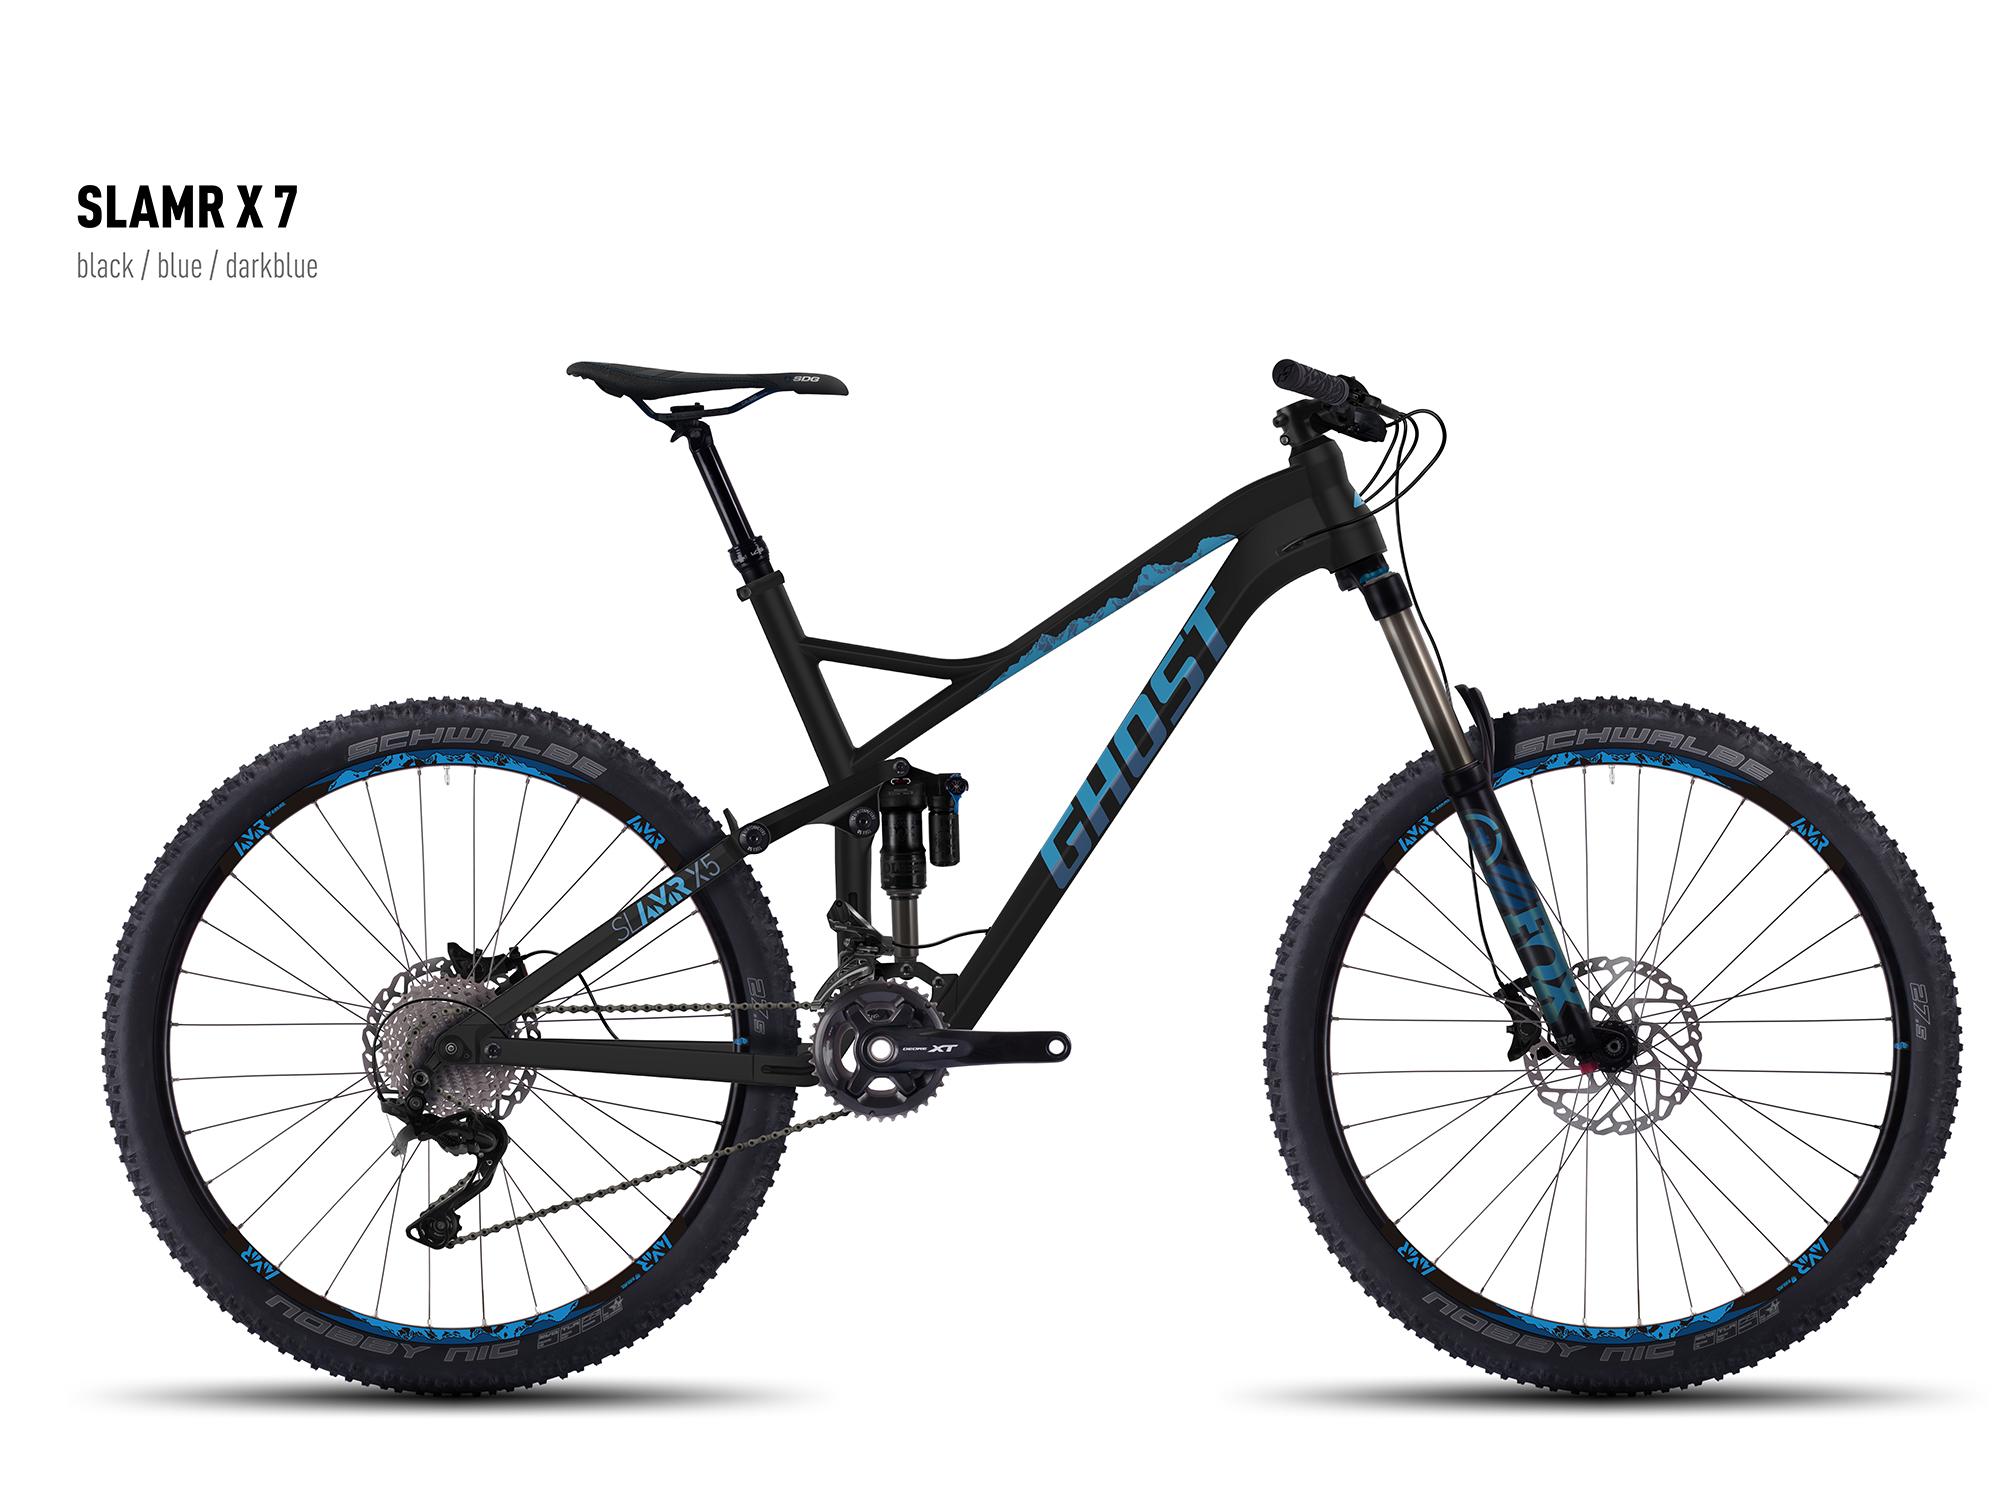 "GHOST SL AMR X 7 black/blue/darkblue S / 44cm / 17,5"" , 2016"